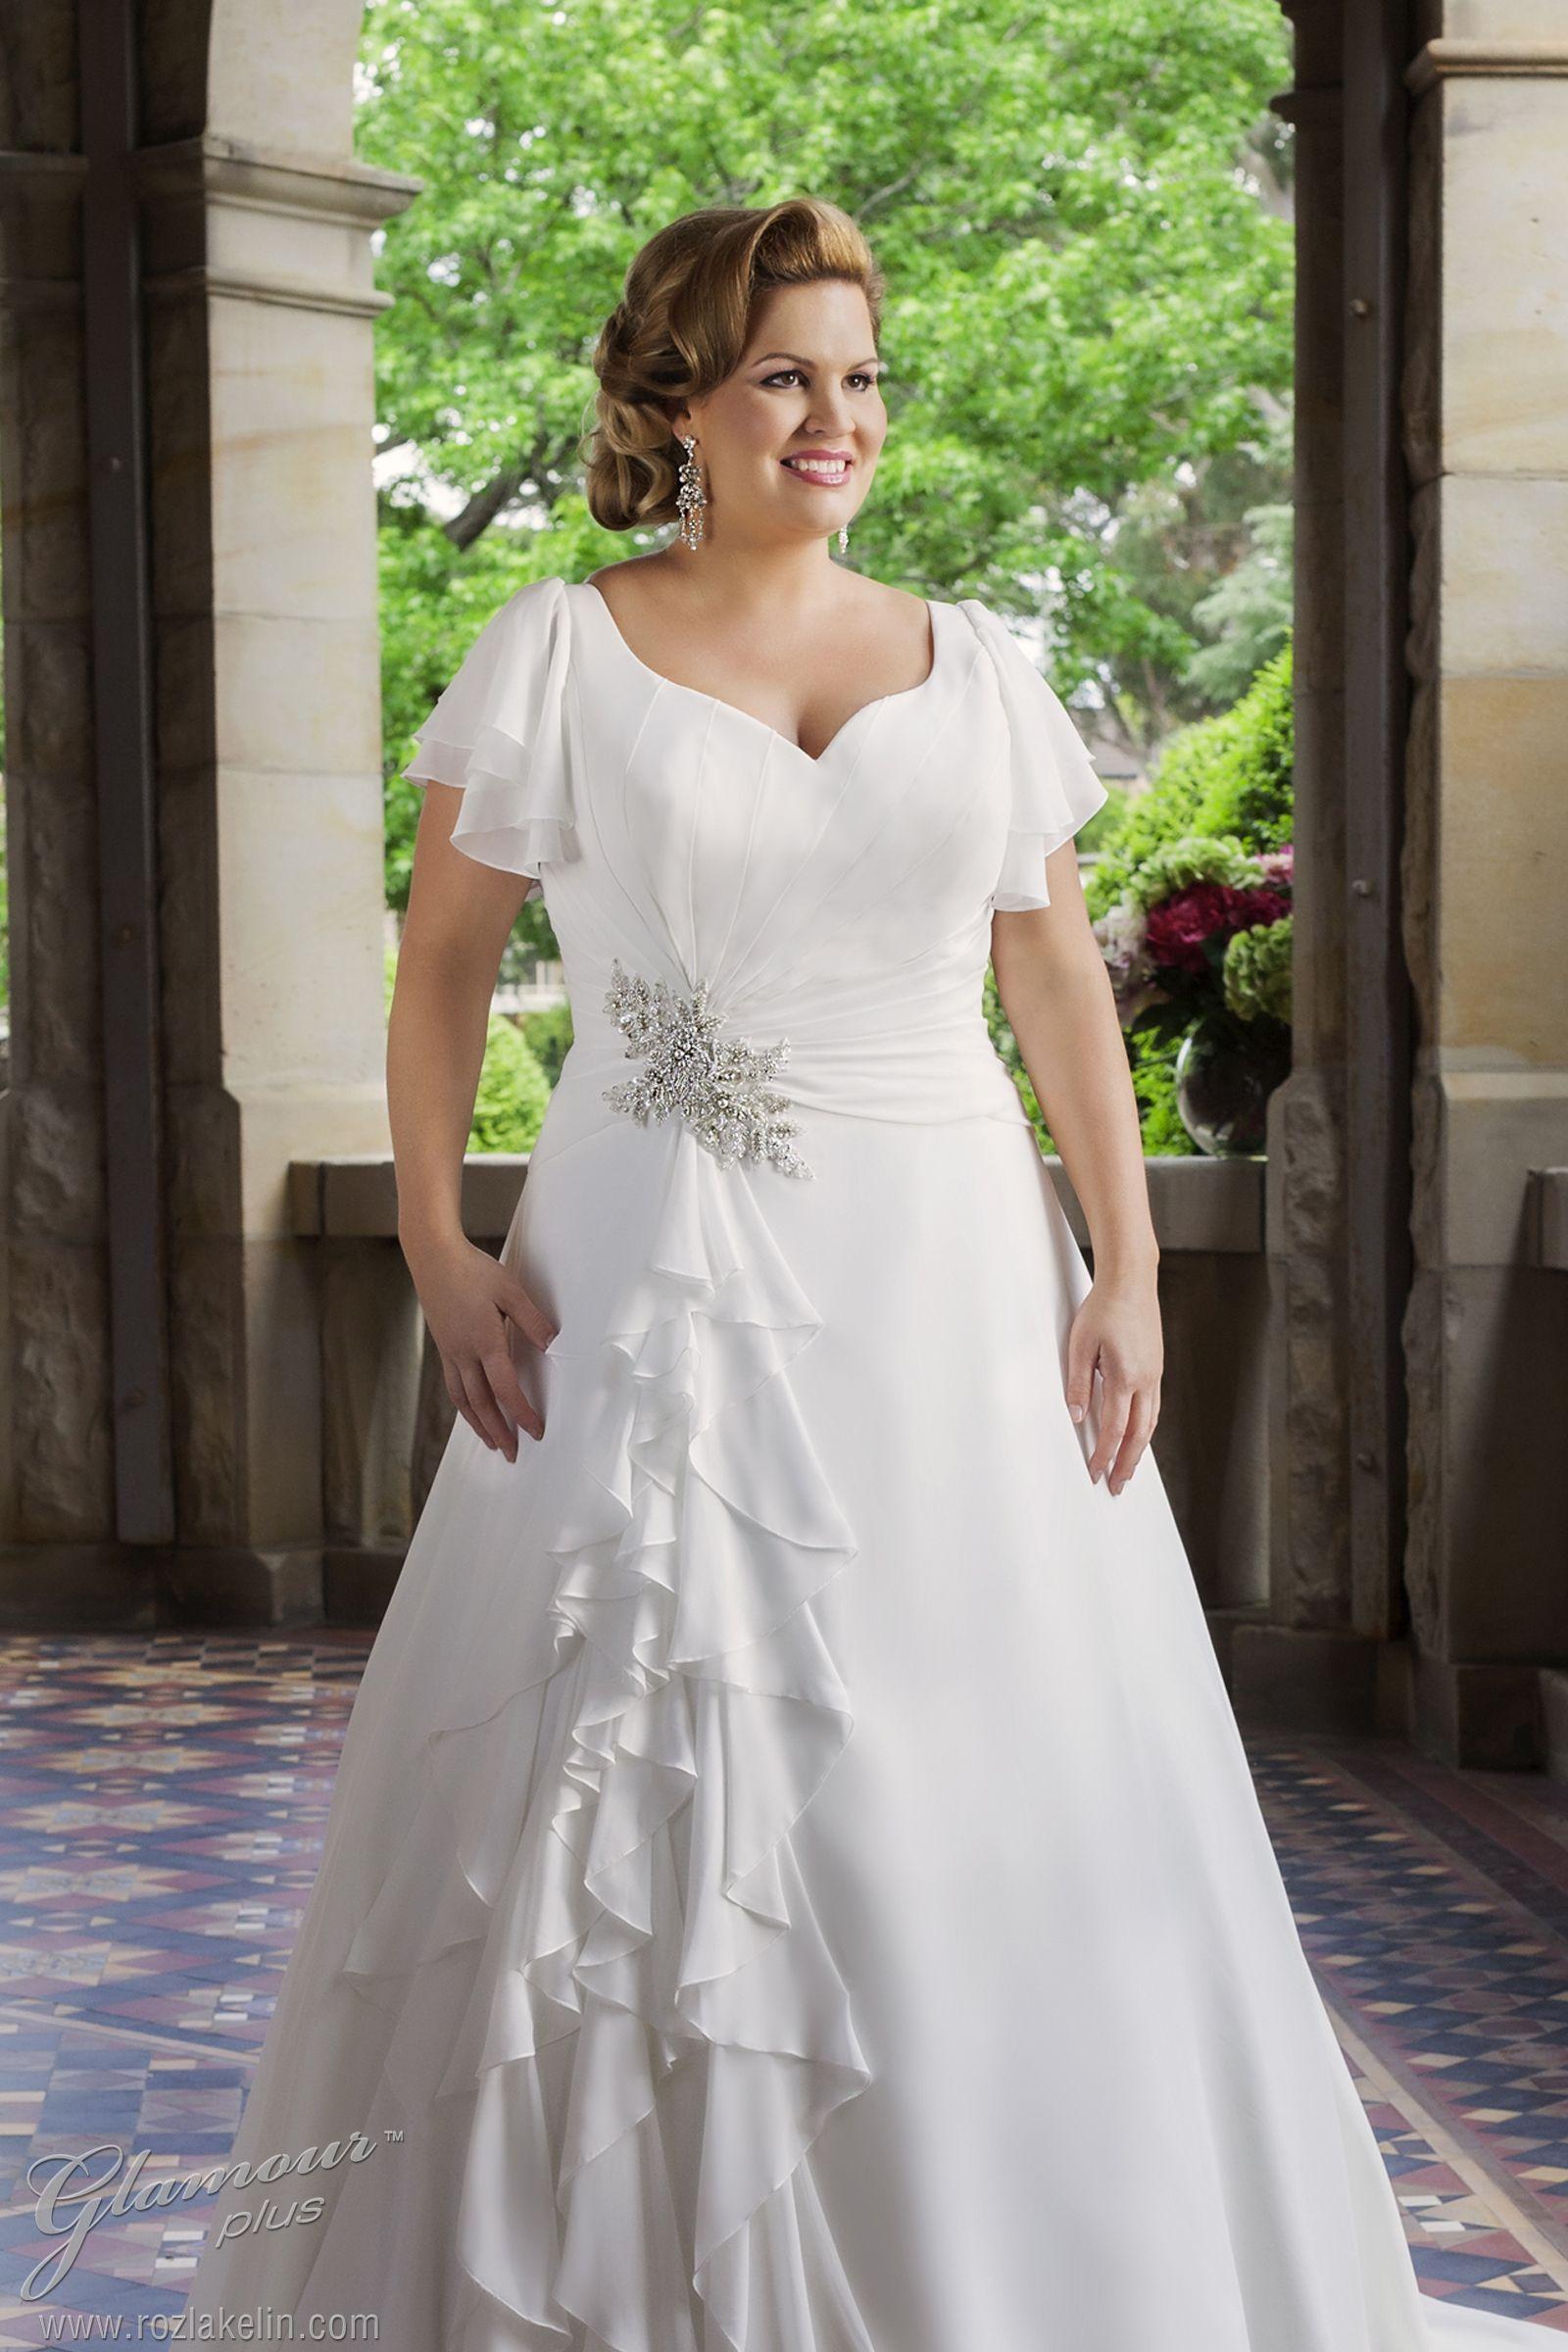 Brand glamour plus bridal style elenora style code t soft